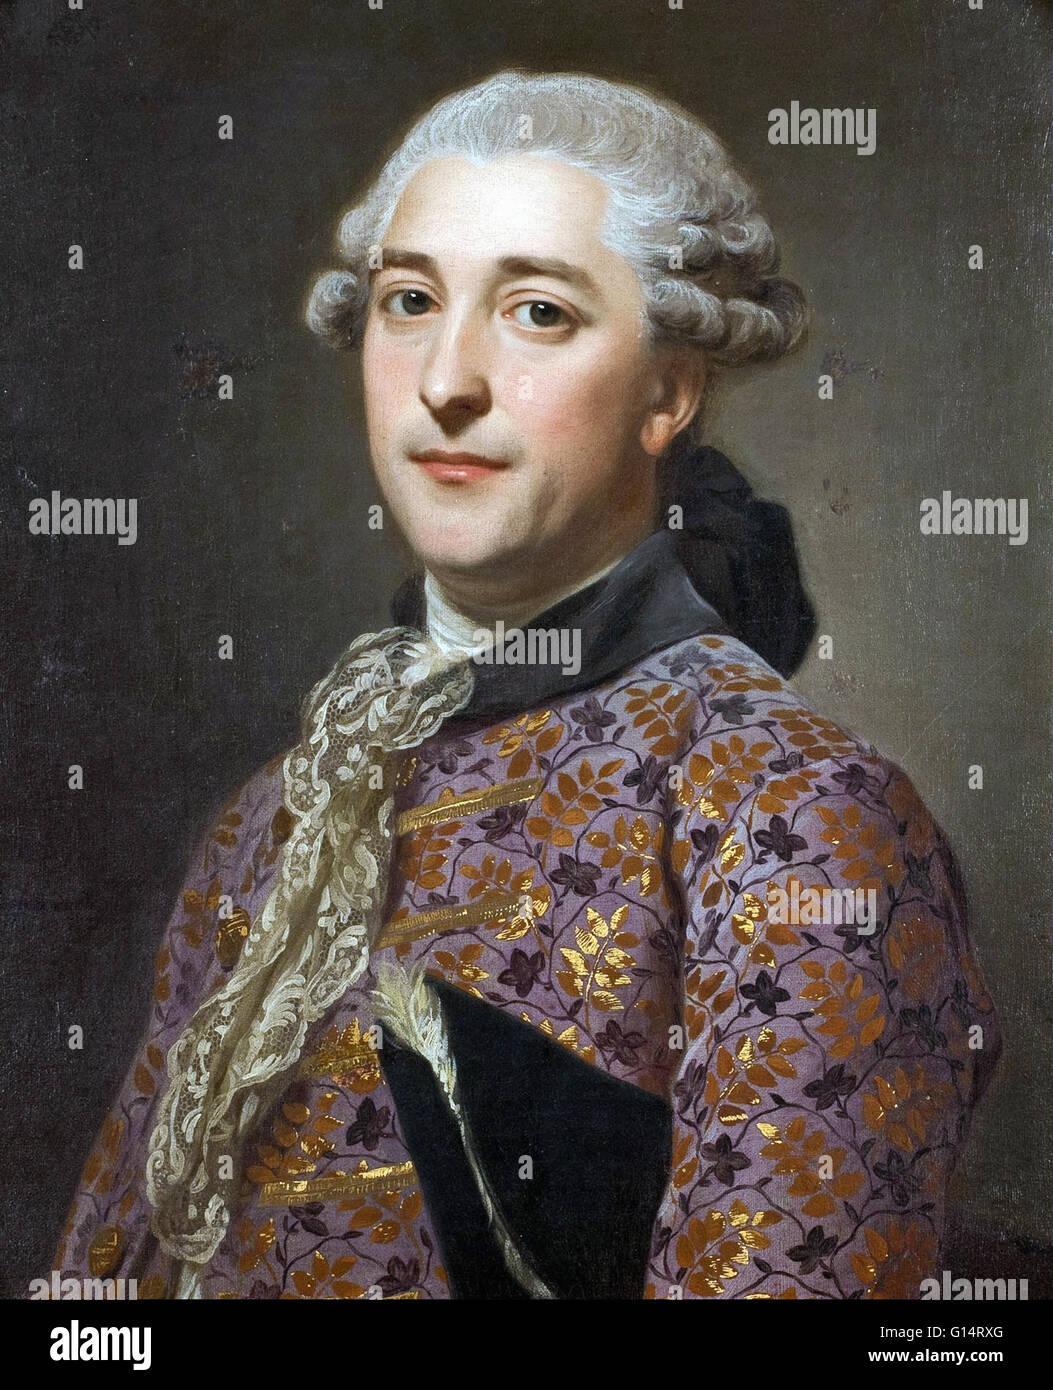 Alexander Roslin - Portrait of Prince Vladimir Golitsyn Borisovtj - Stock Image